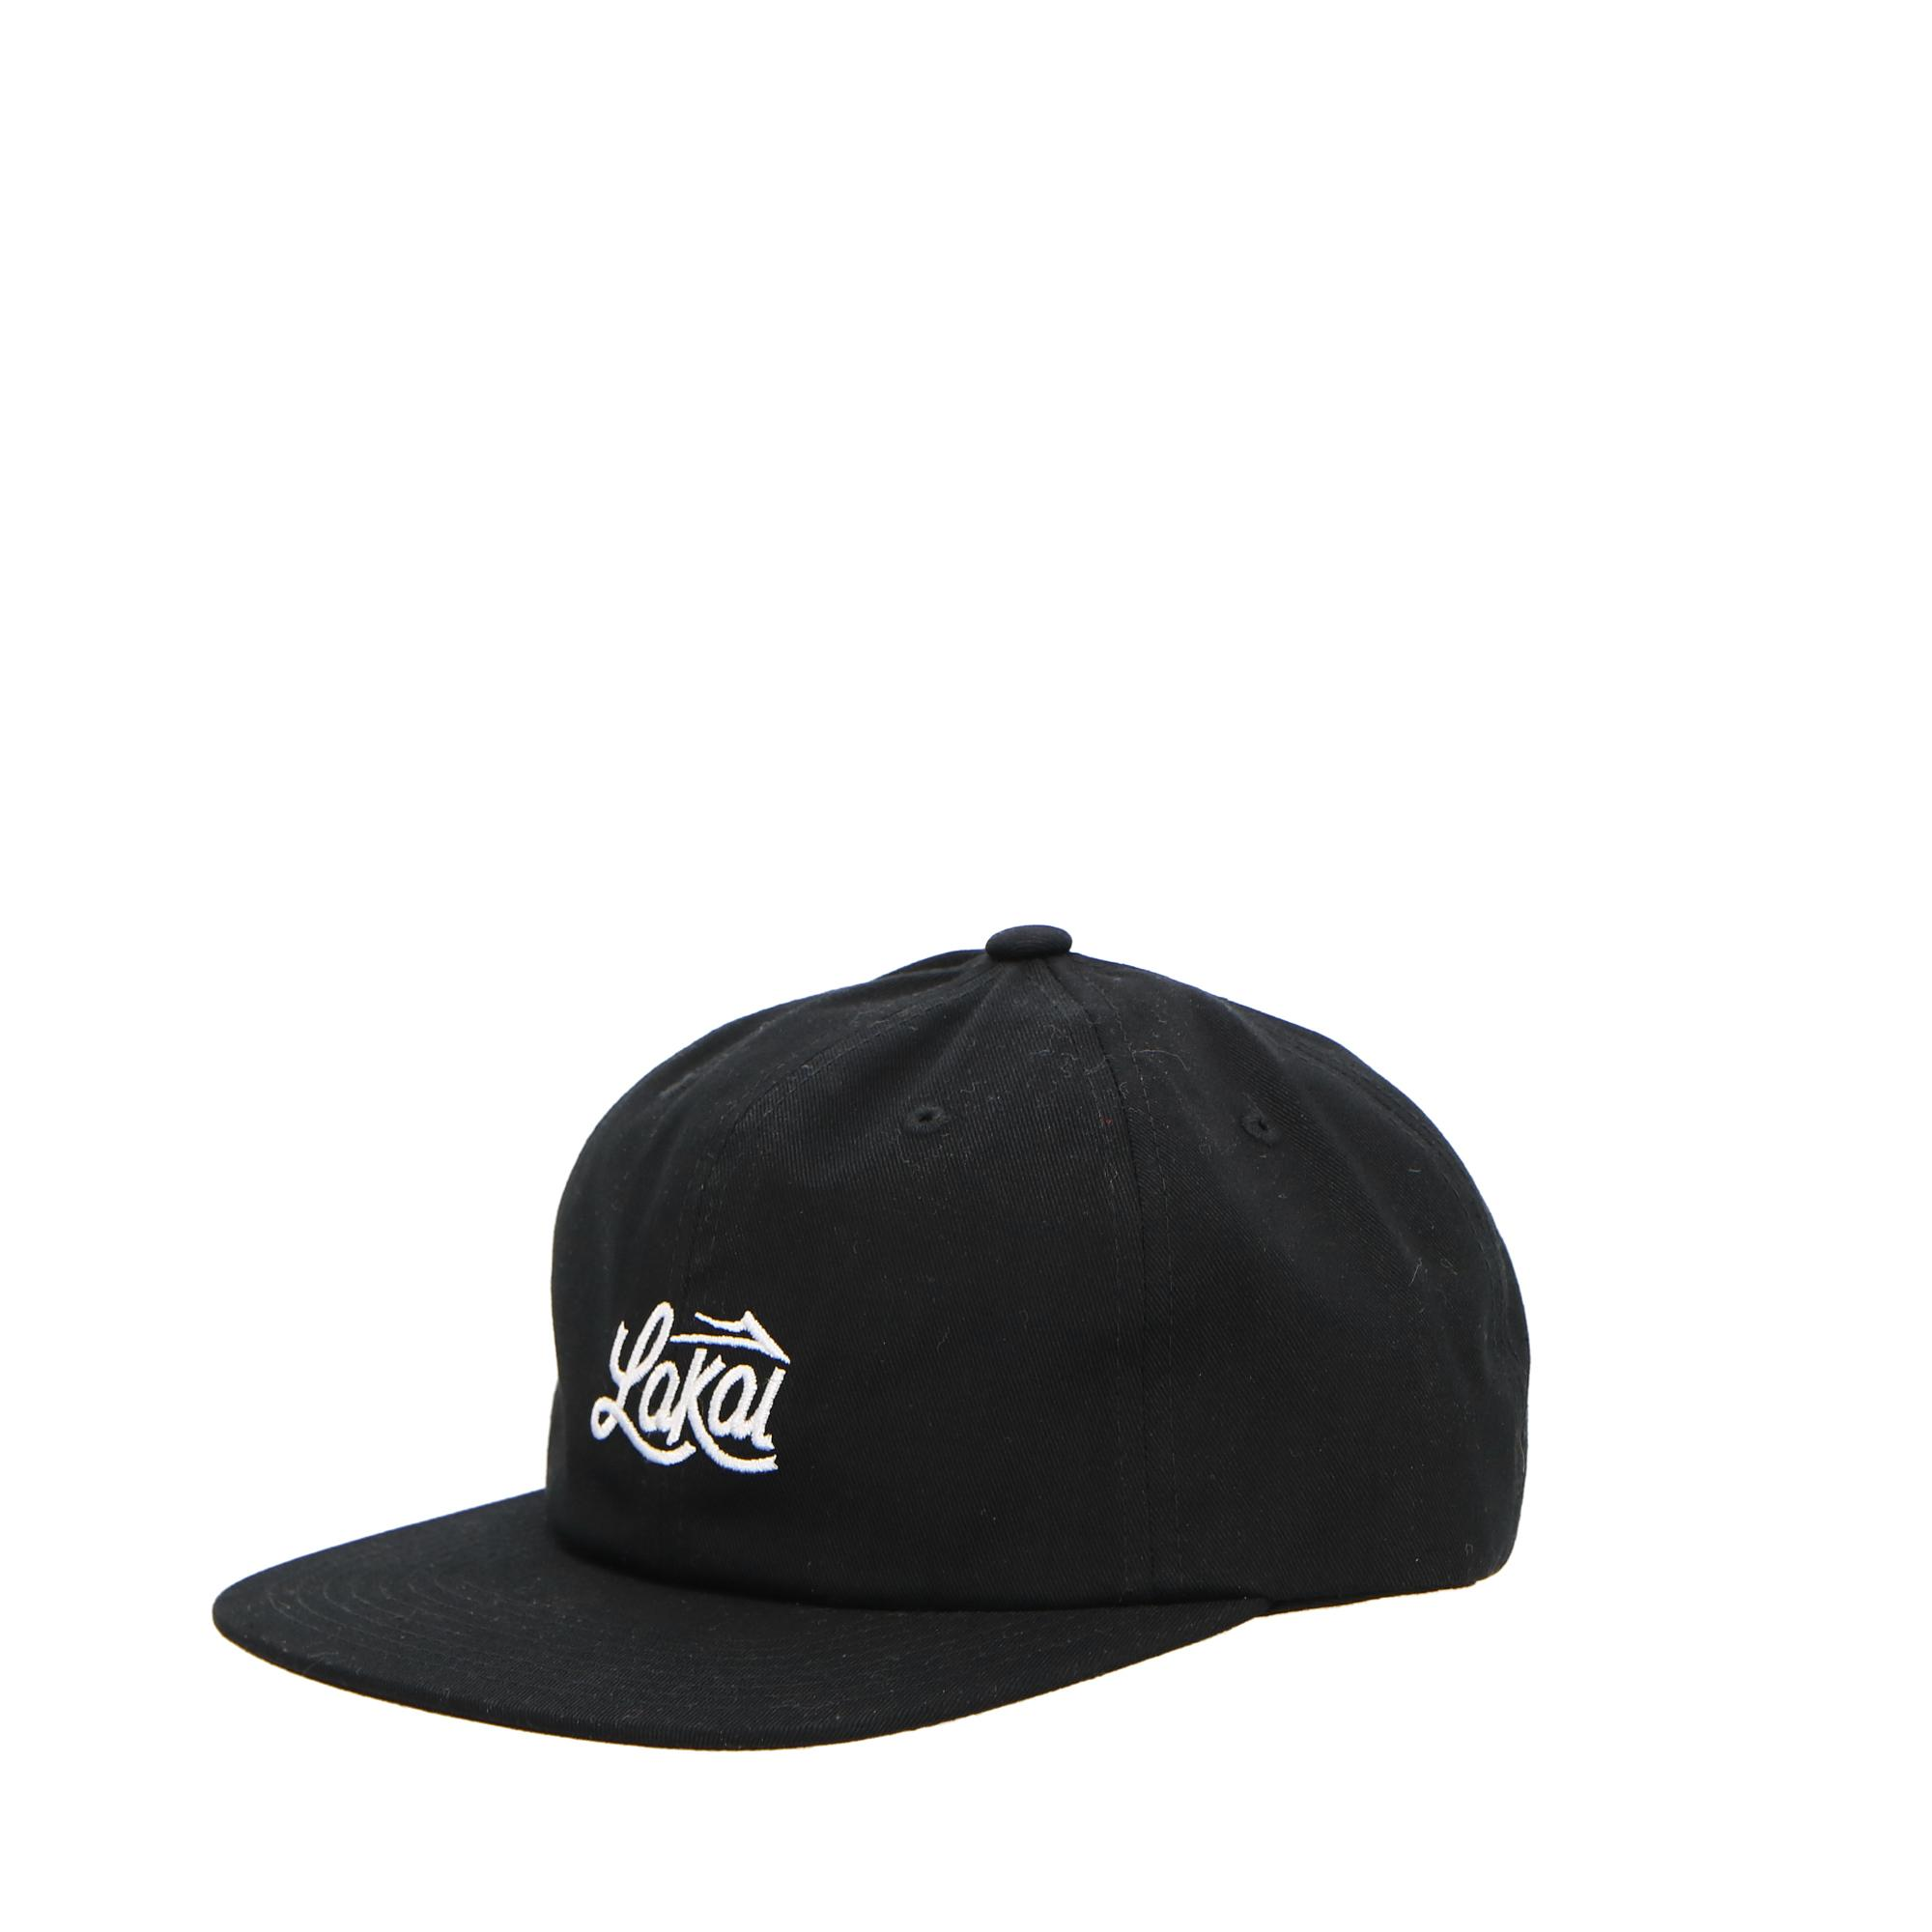 Lakai Sign Polo Strapback Black